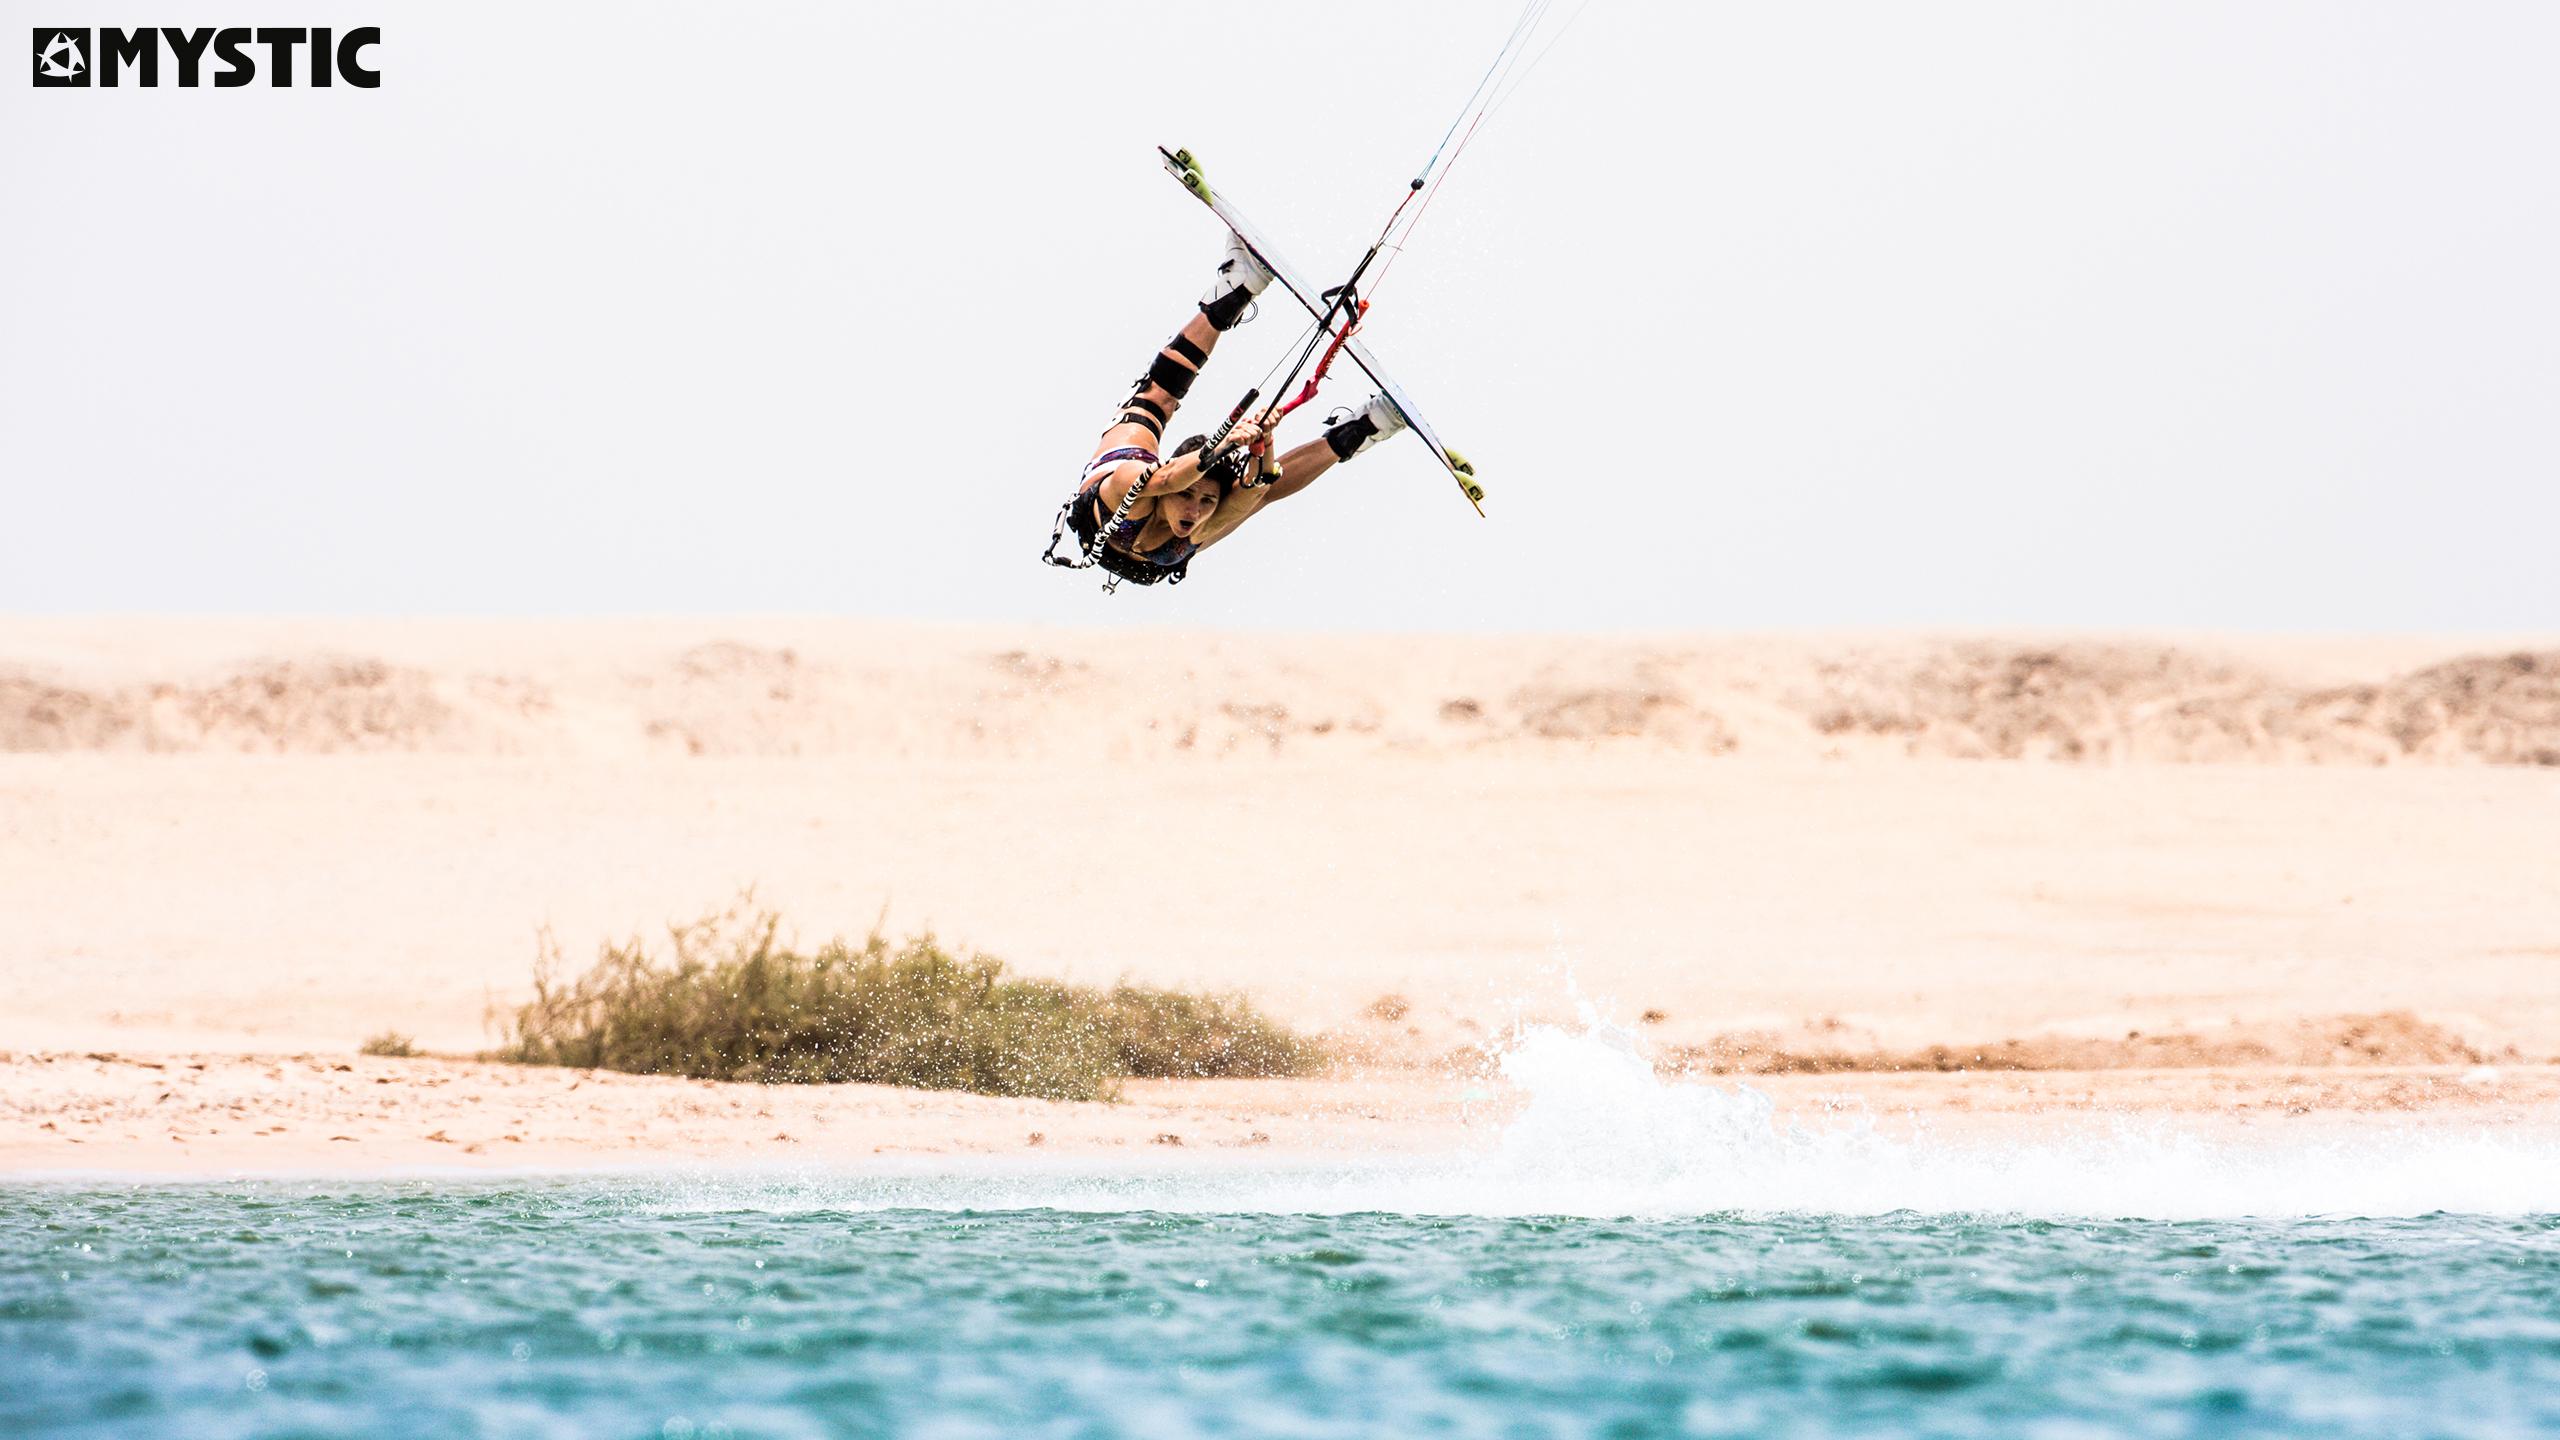 kitesurf wallpaper image - Bruna Kajiya with a raily - kitesurfing - in resolution: Original 2560 X 1440